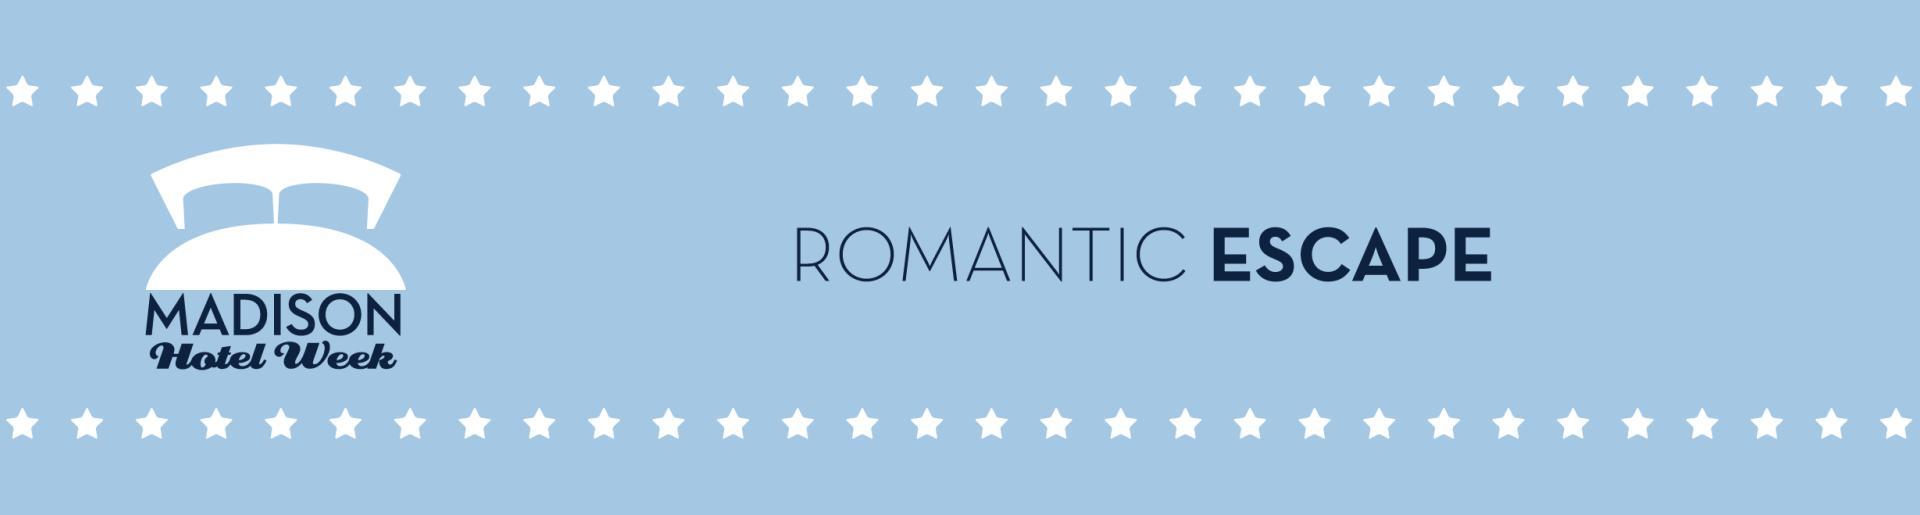 Madison Hotel Week 2017 Romantic